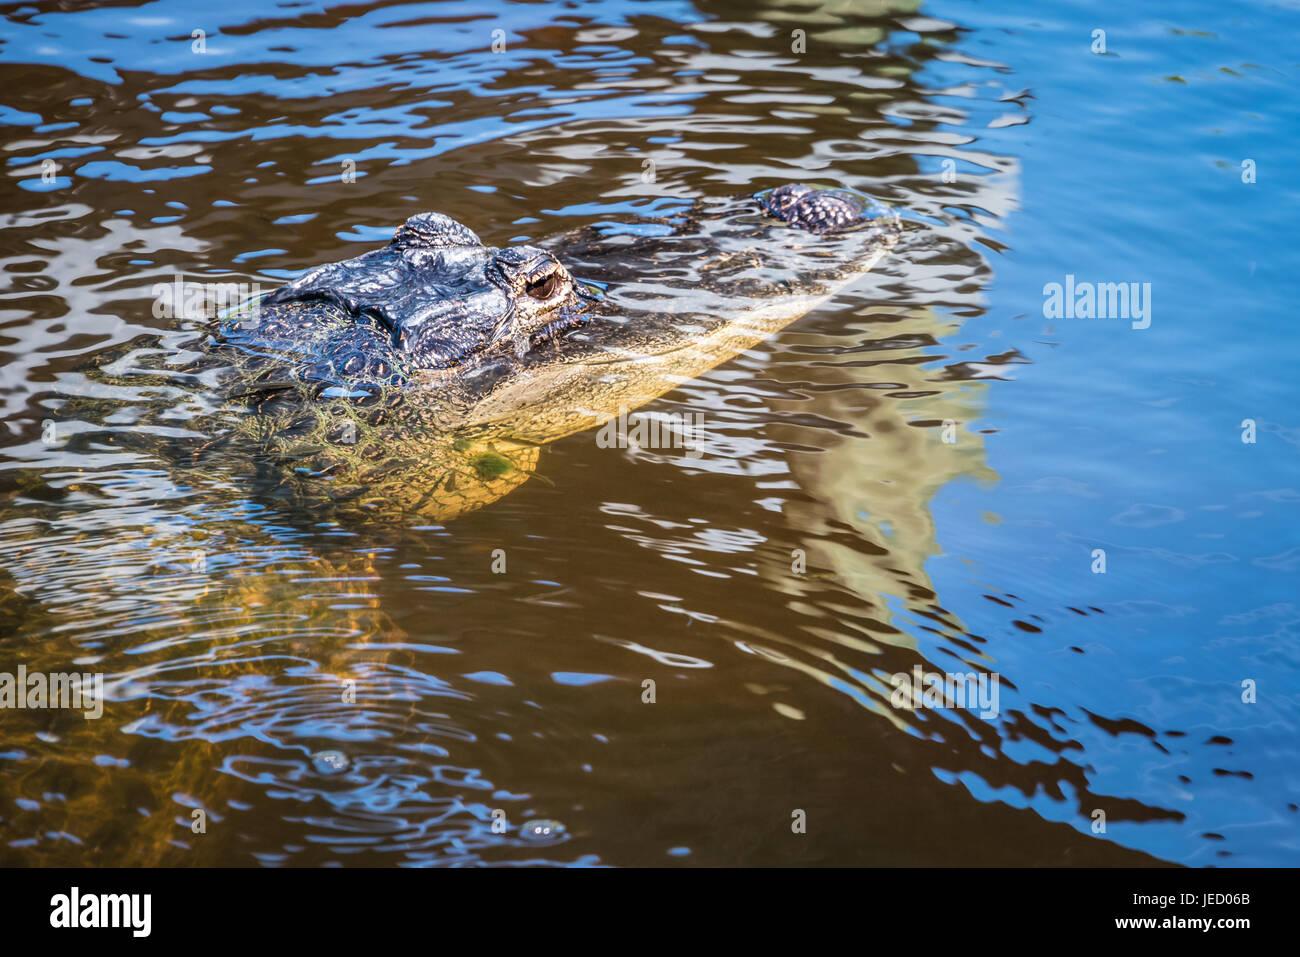 Florida alligator. - Stock Image